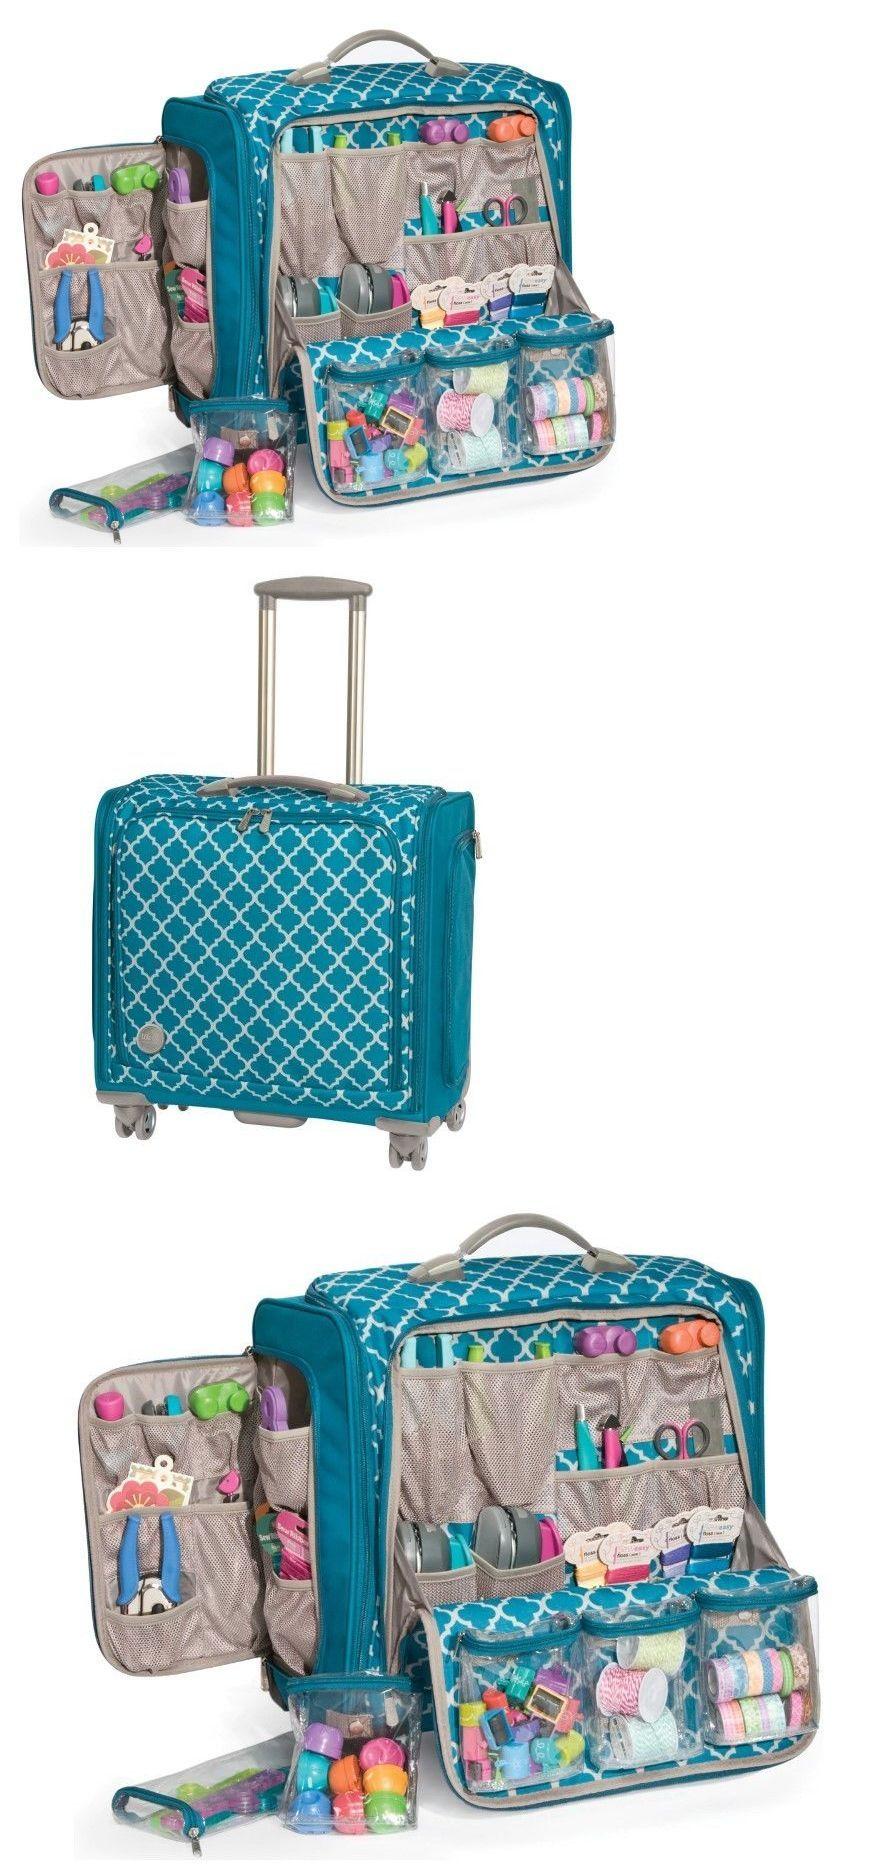 67d7c6c8d4 Scrapbooking Totes 146401  Craft Tote Bag Sewing Supplies Organizer Case  Wheels Storage Large Crafts Bag